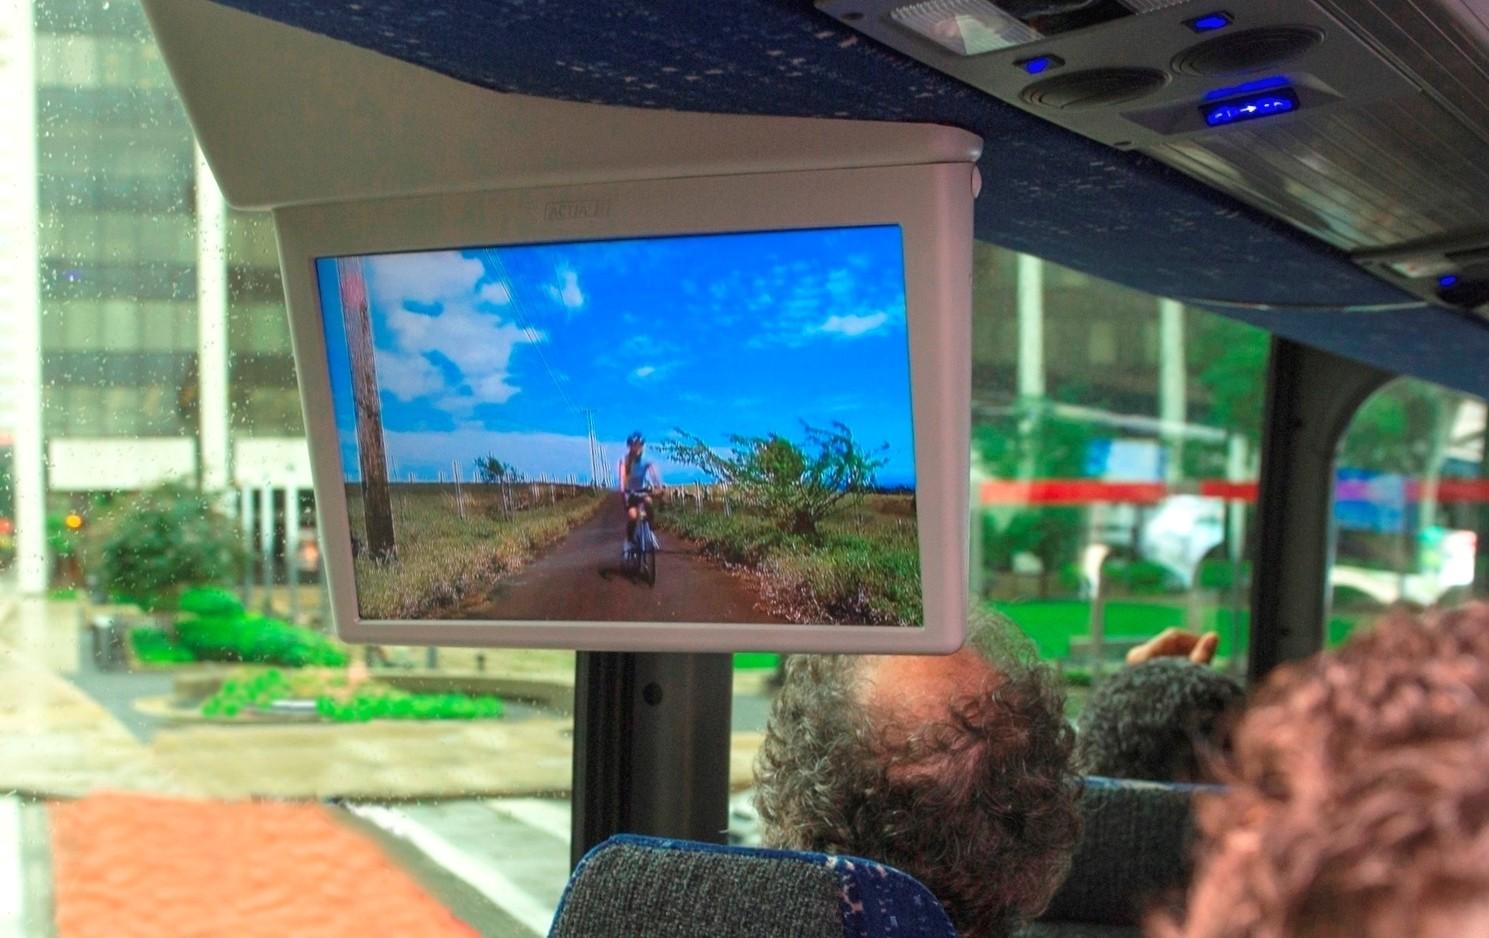 Experts watch videos on a bus via ATSC 3.0 signals